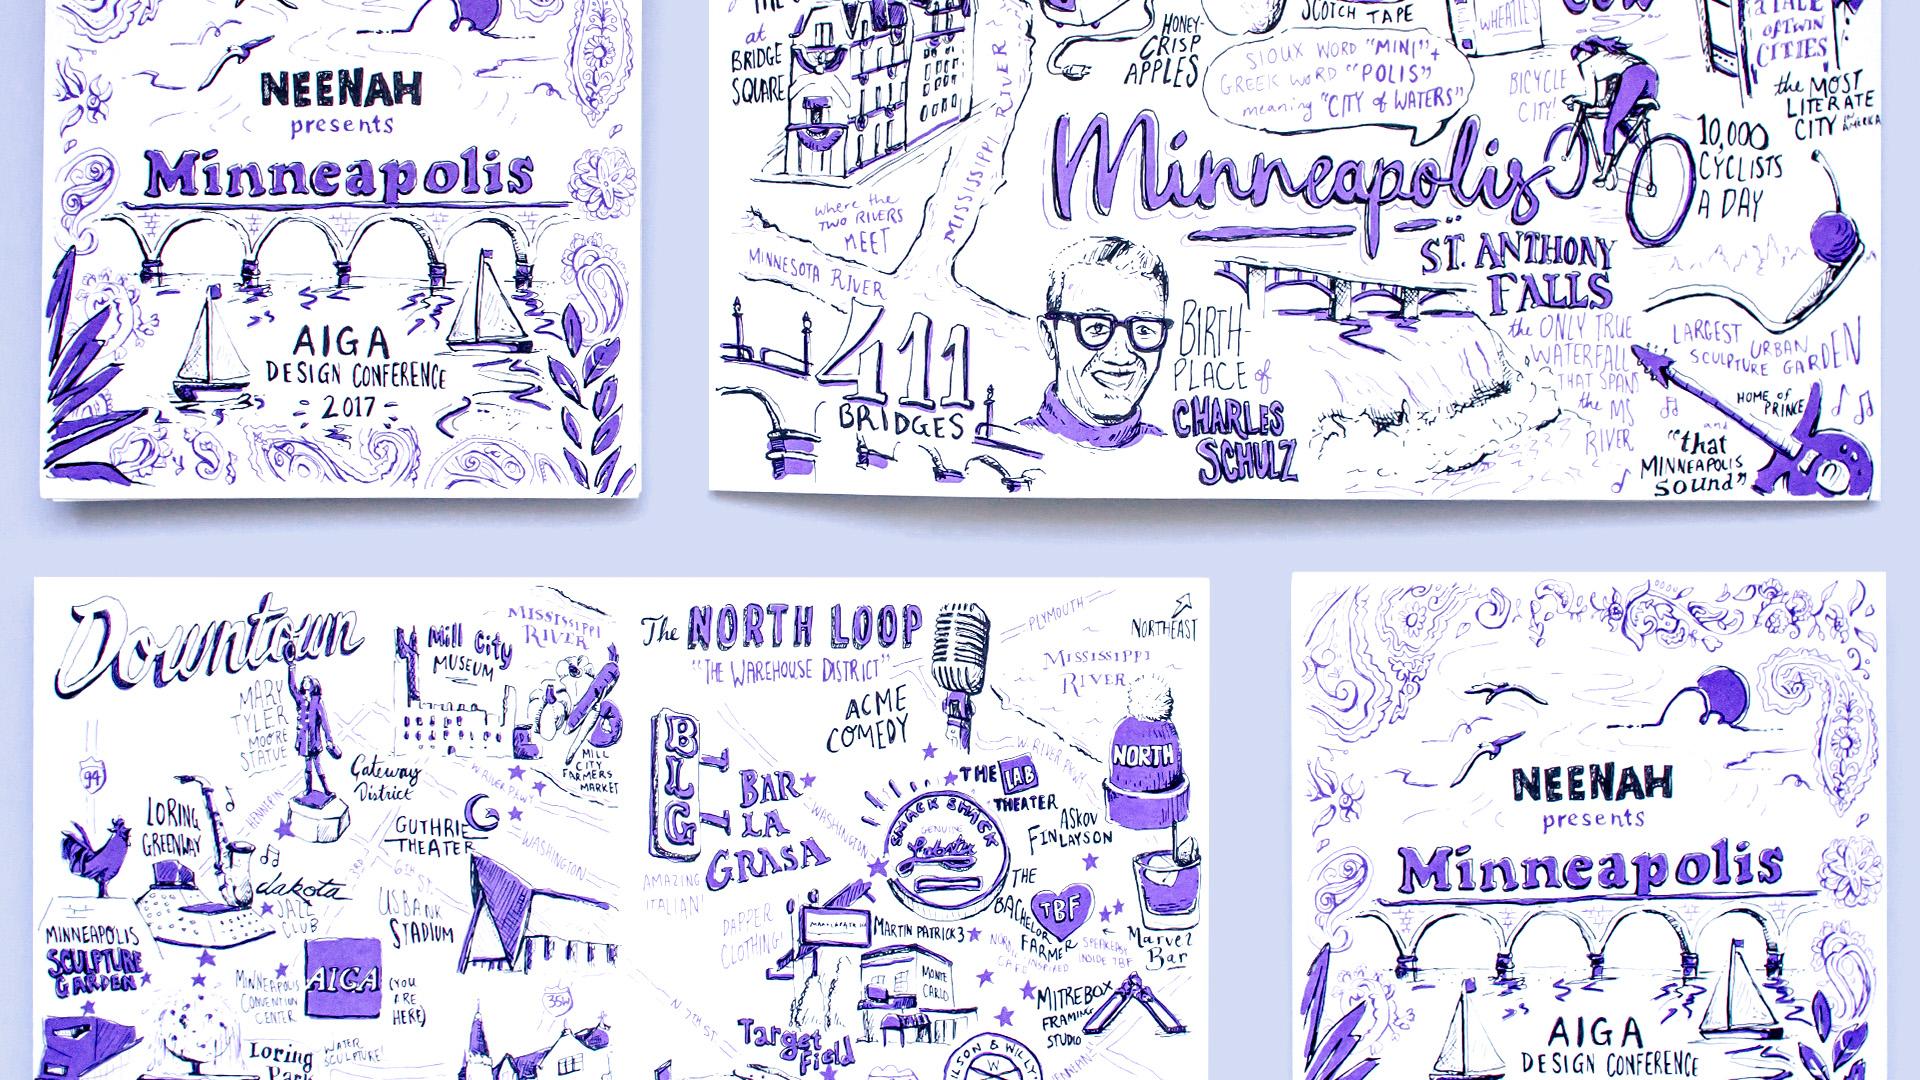 Neenah Minneapolis map unfolded